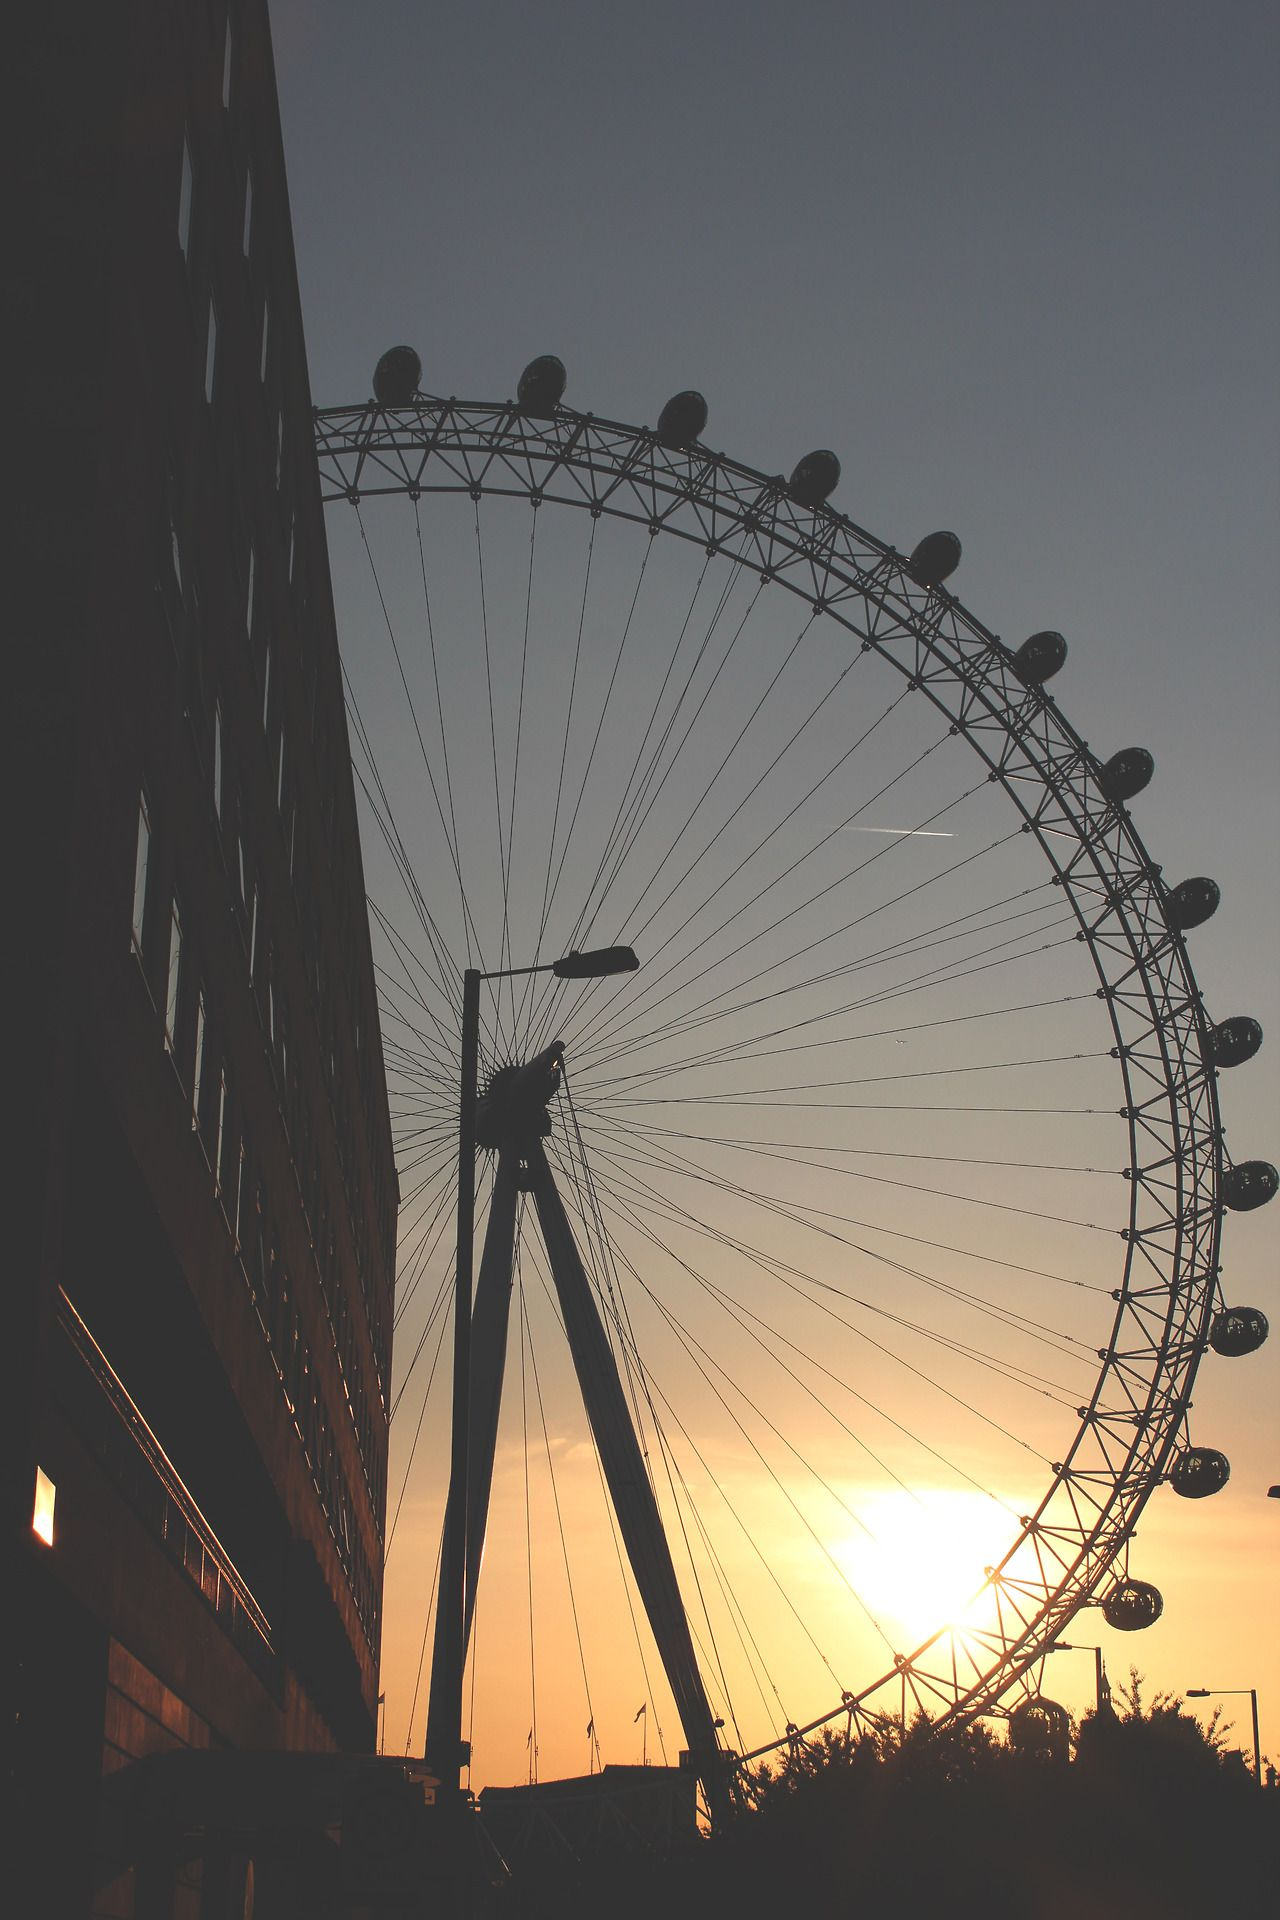 (2) Tumblr photo, giant, swirling sunset, ferris